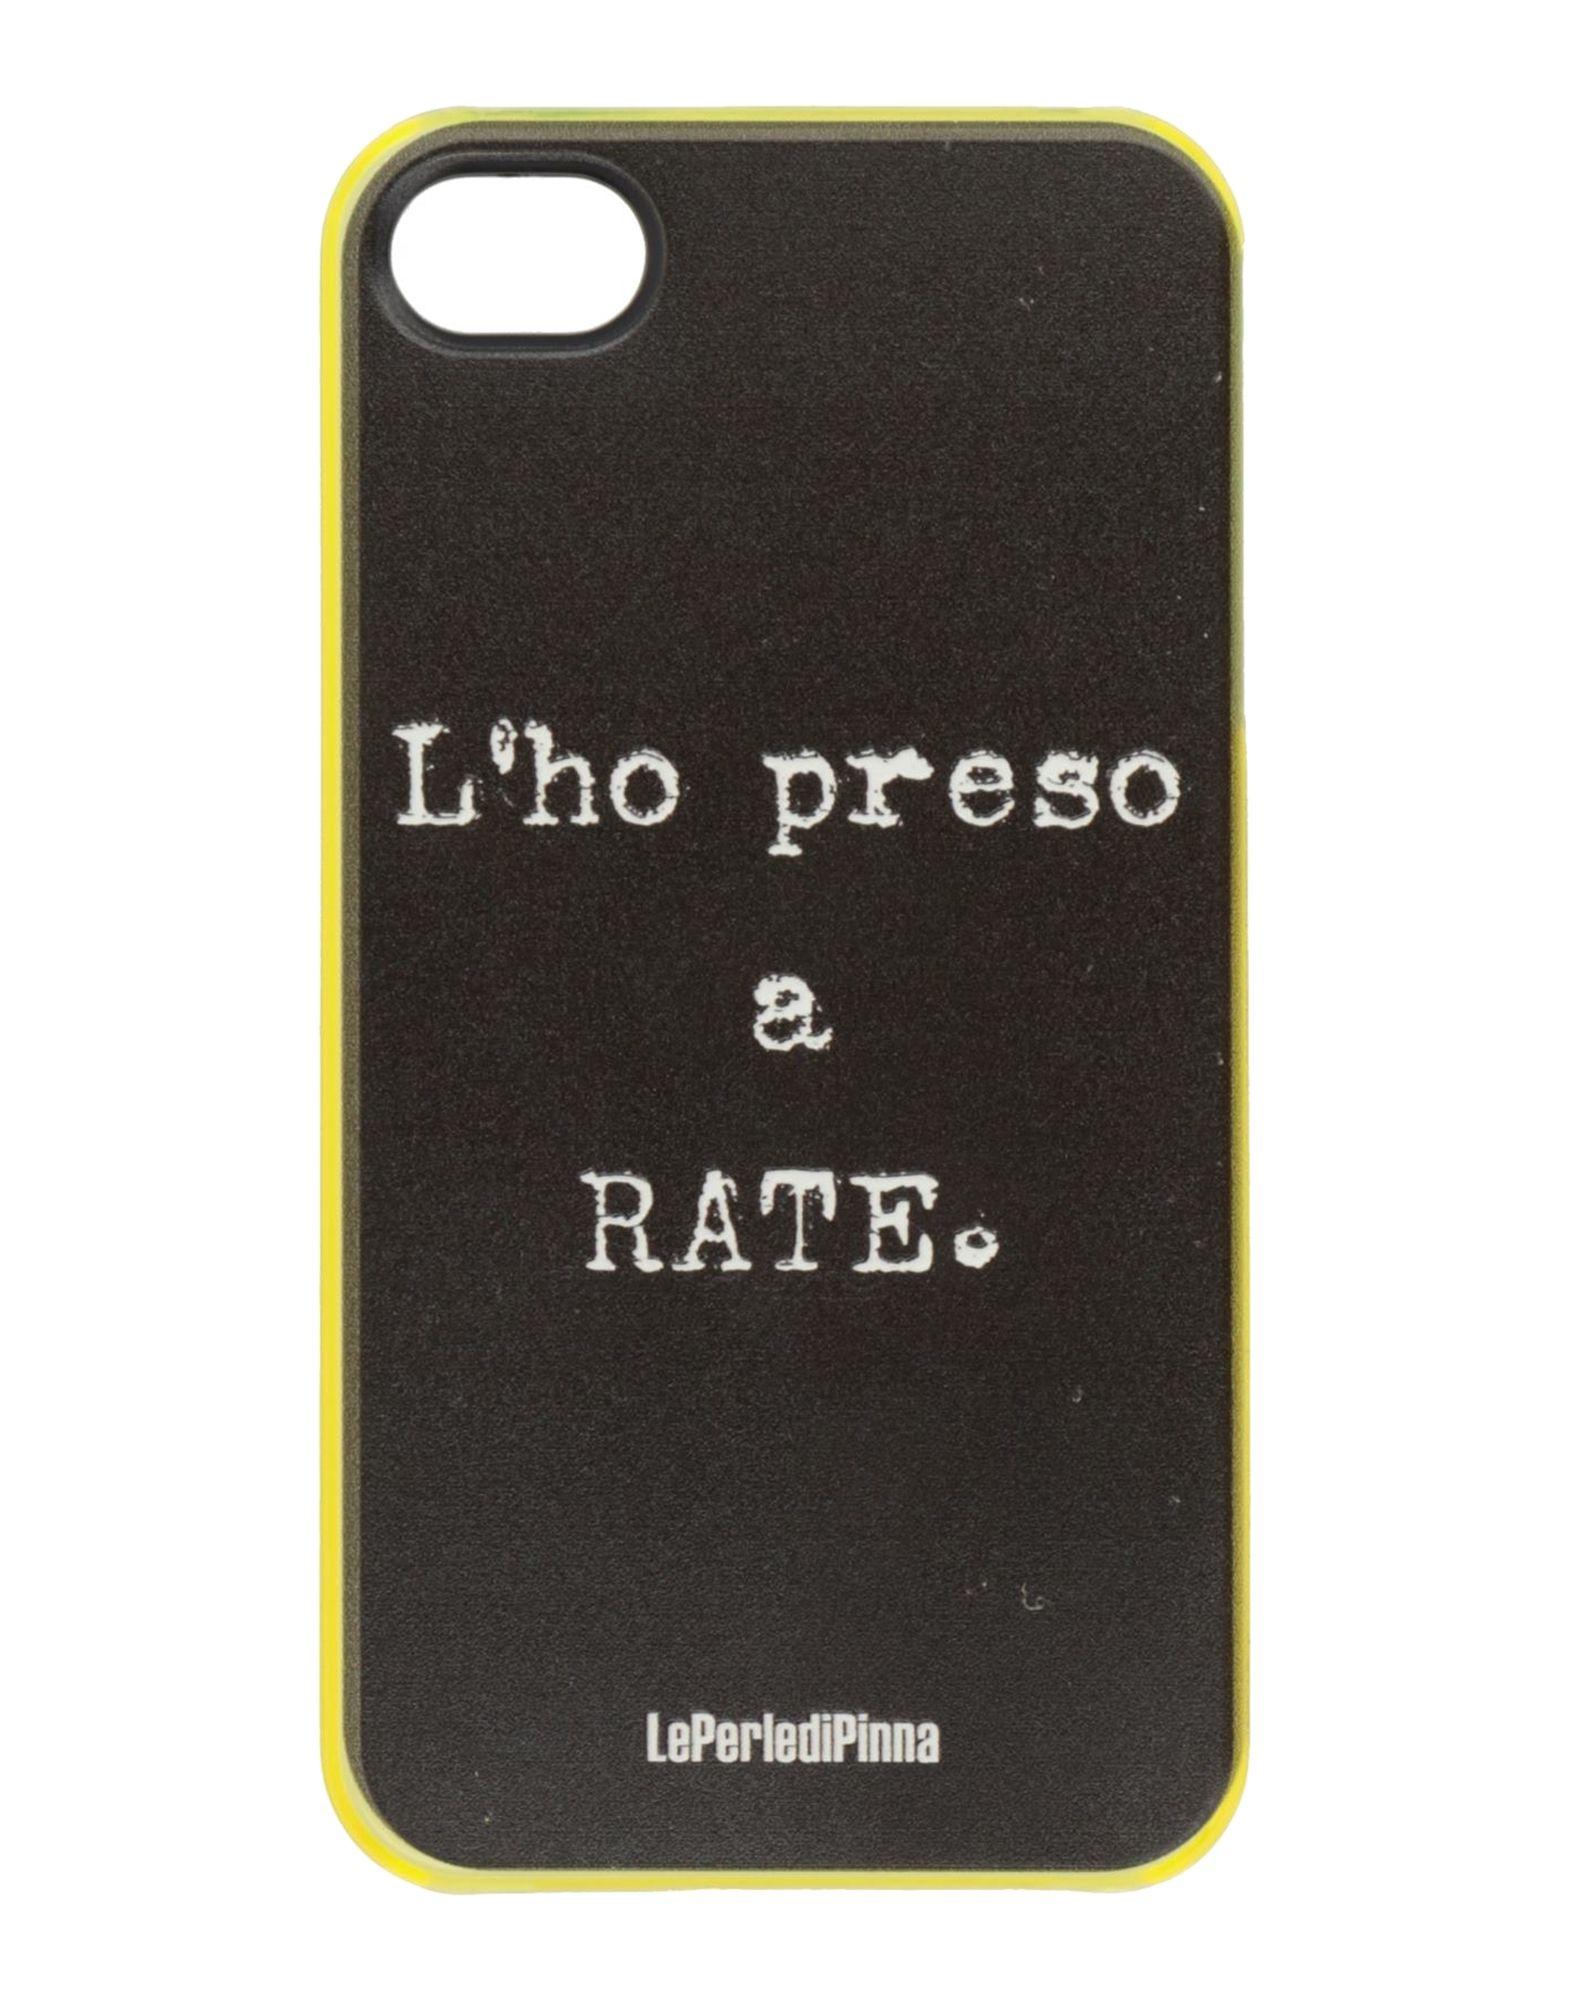 Фото - HAPPINESS Чехол чехол для сотового телефона onzo chic iphone xs прозрачный серебристый